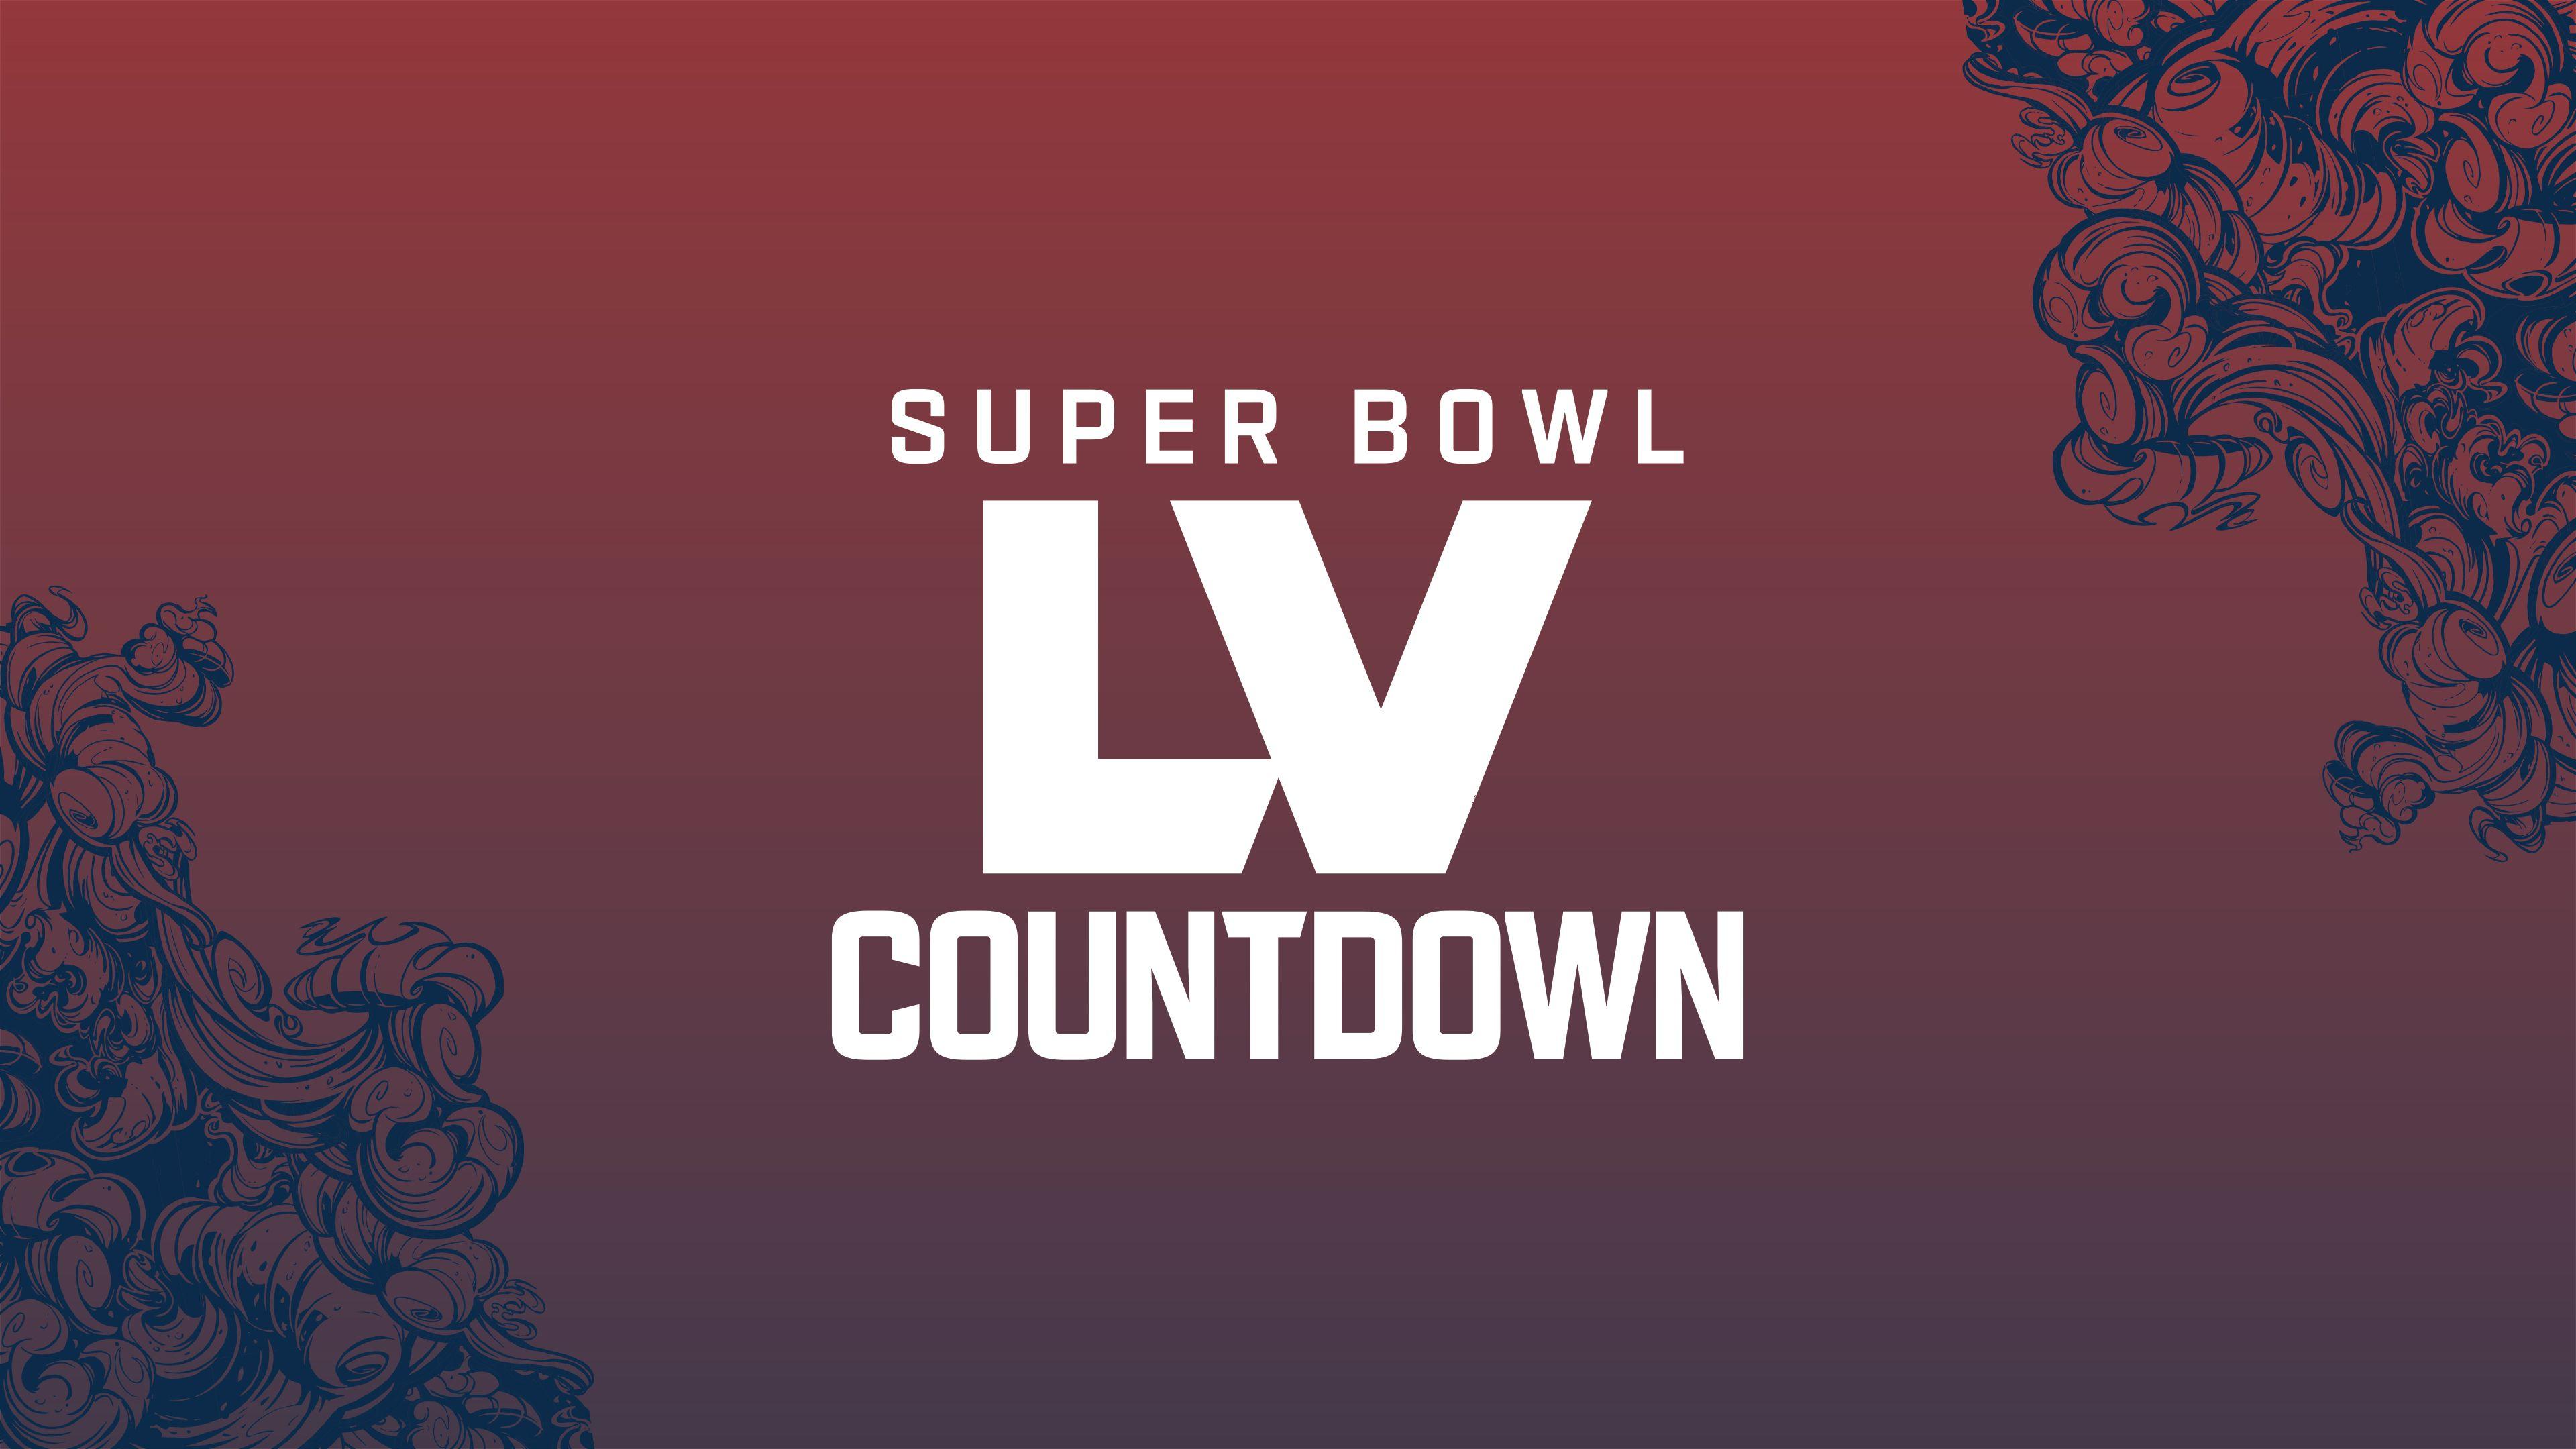 Super Bowl Countdown